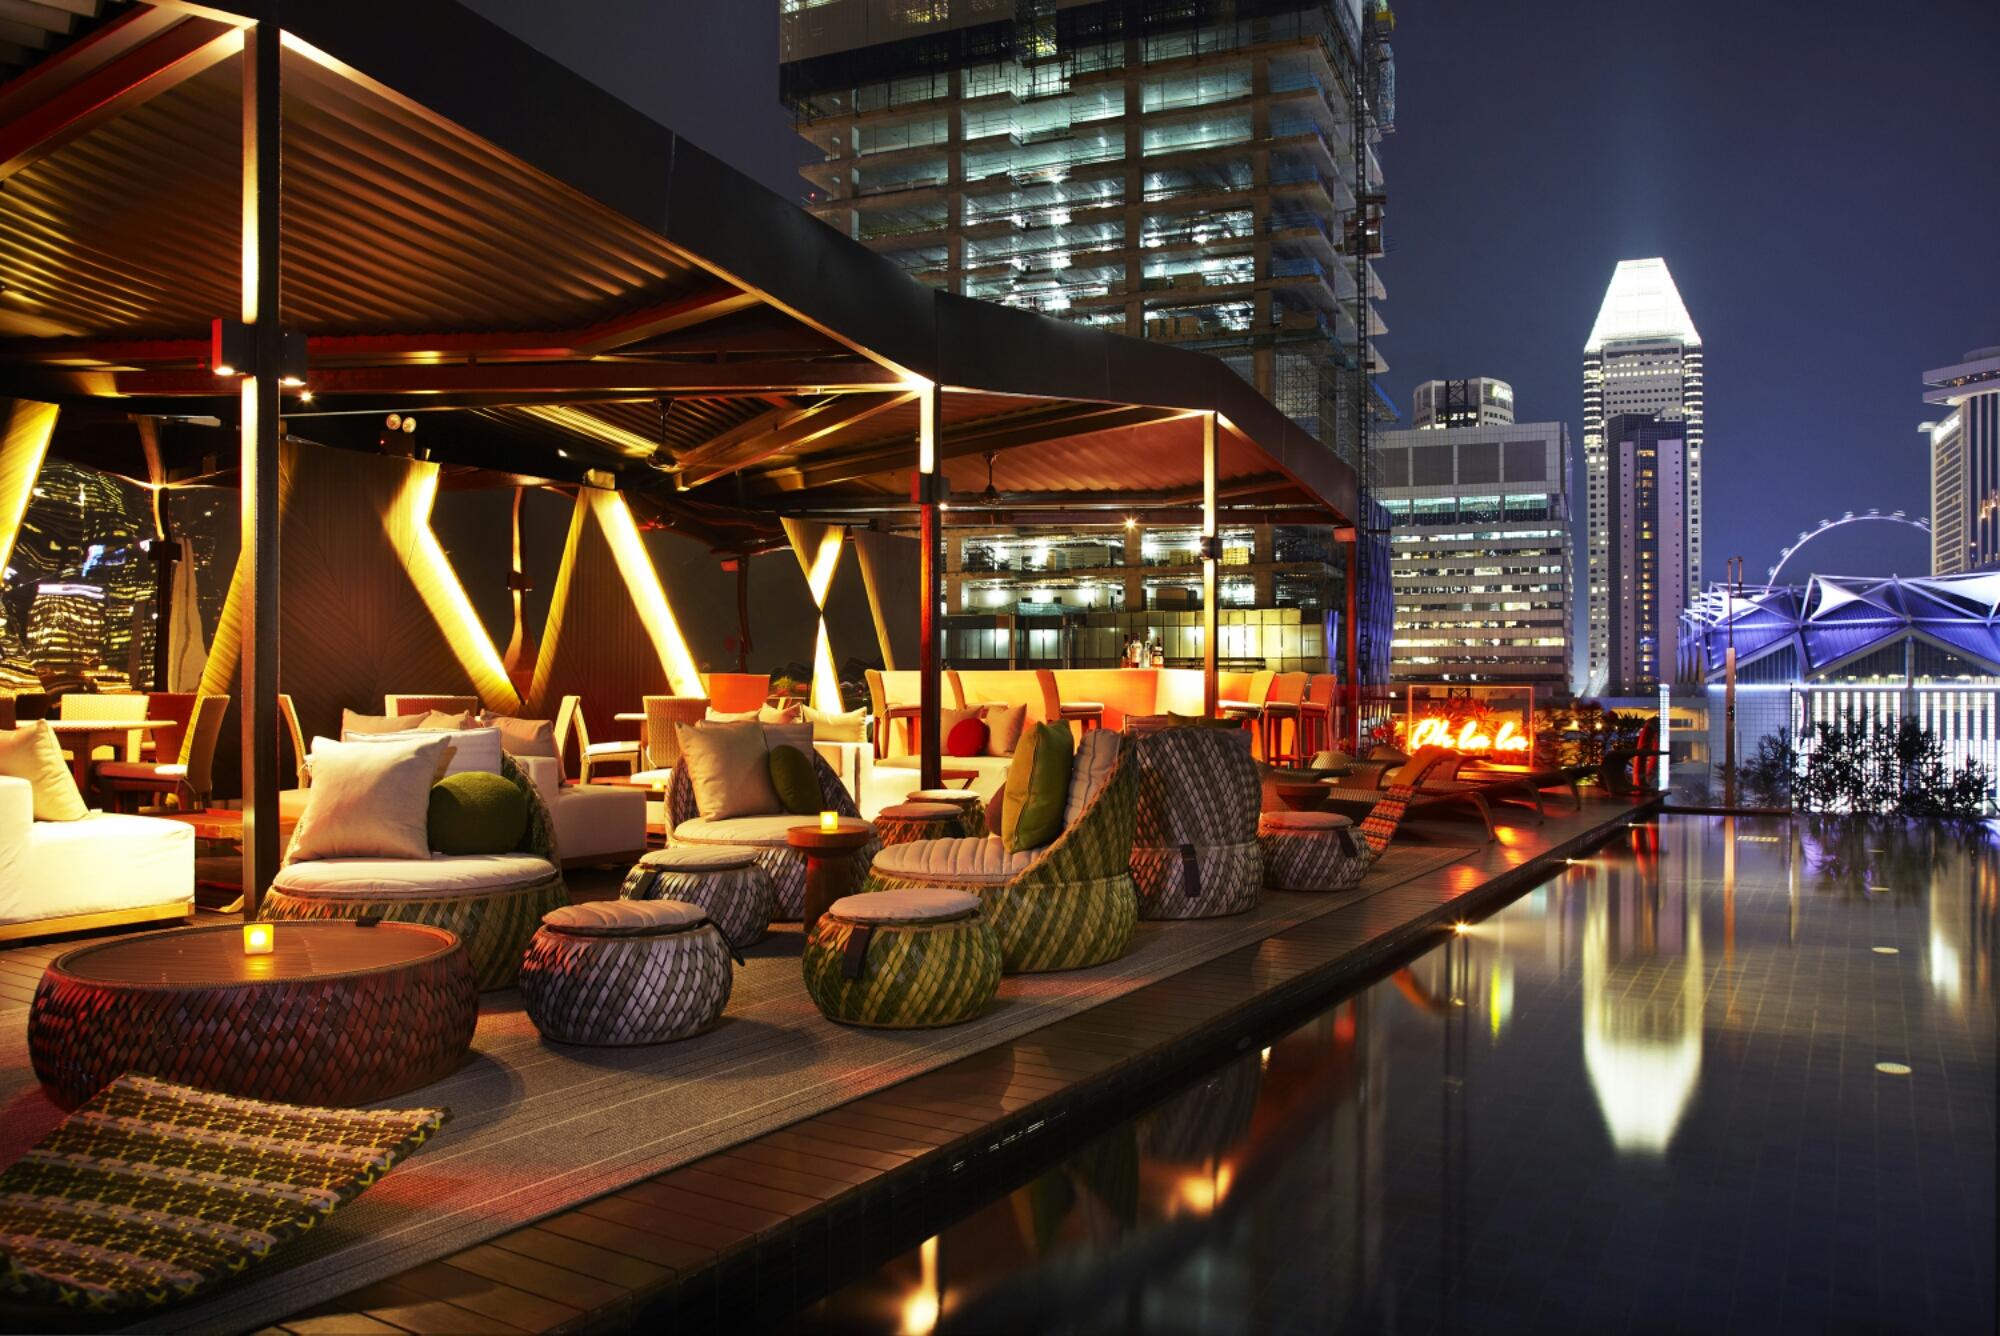 naumi hotel - singapour